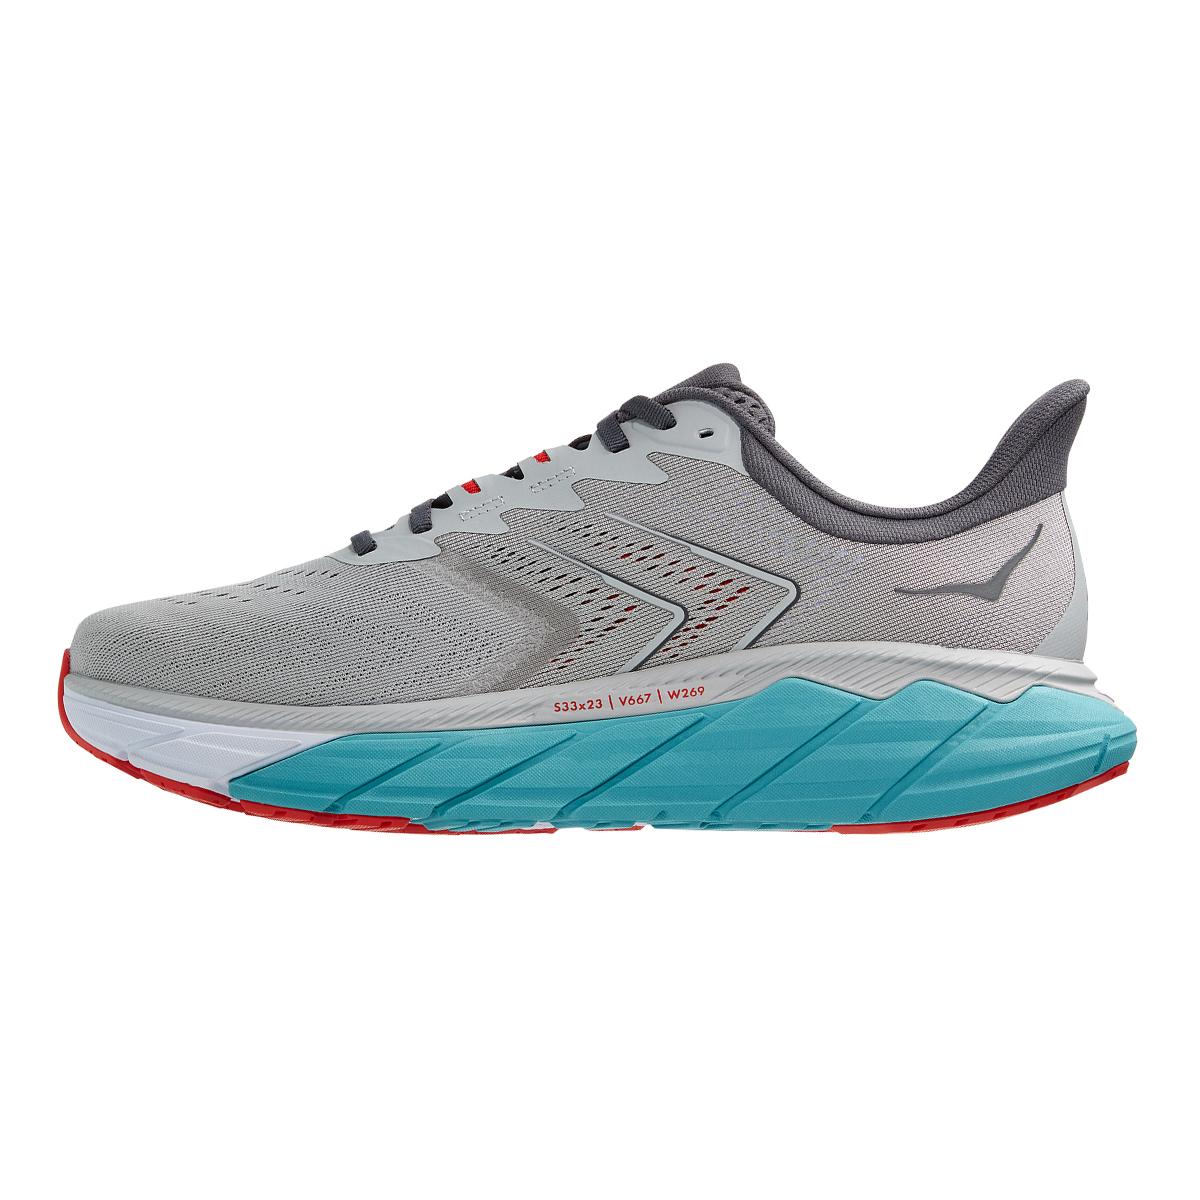 Men's Hoka One One Arahi 5 Running Shoe - Color: Harbor Mist / Aquarelle - Size: 7 - Width: Regular, Harbor Mist / Aquarelle, large, image 2